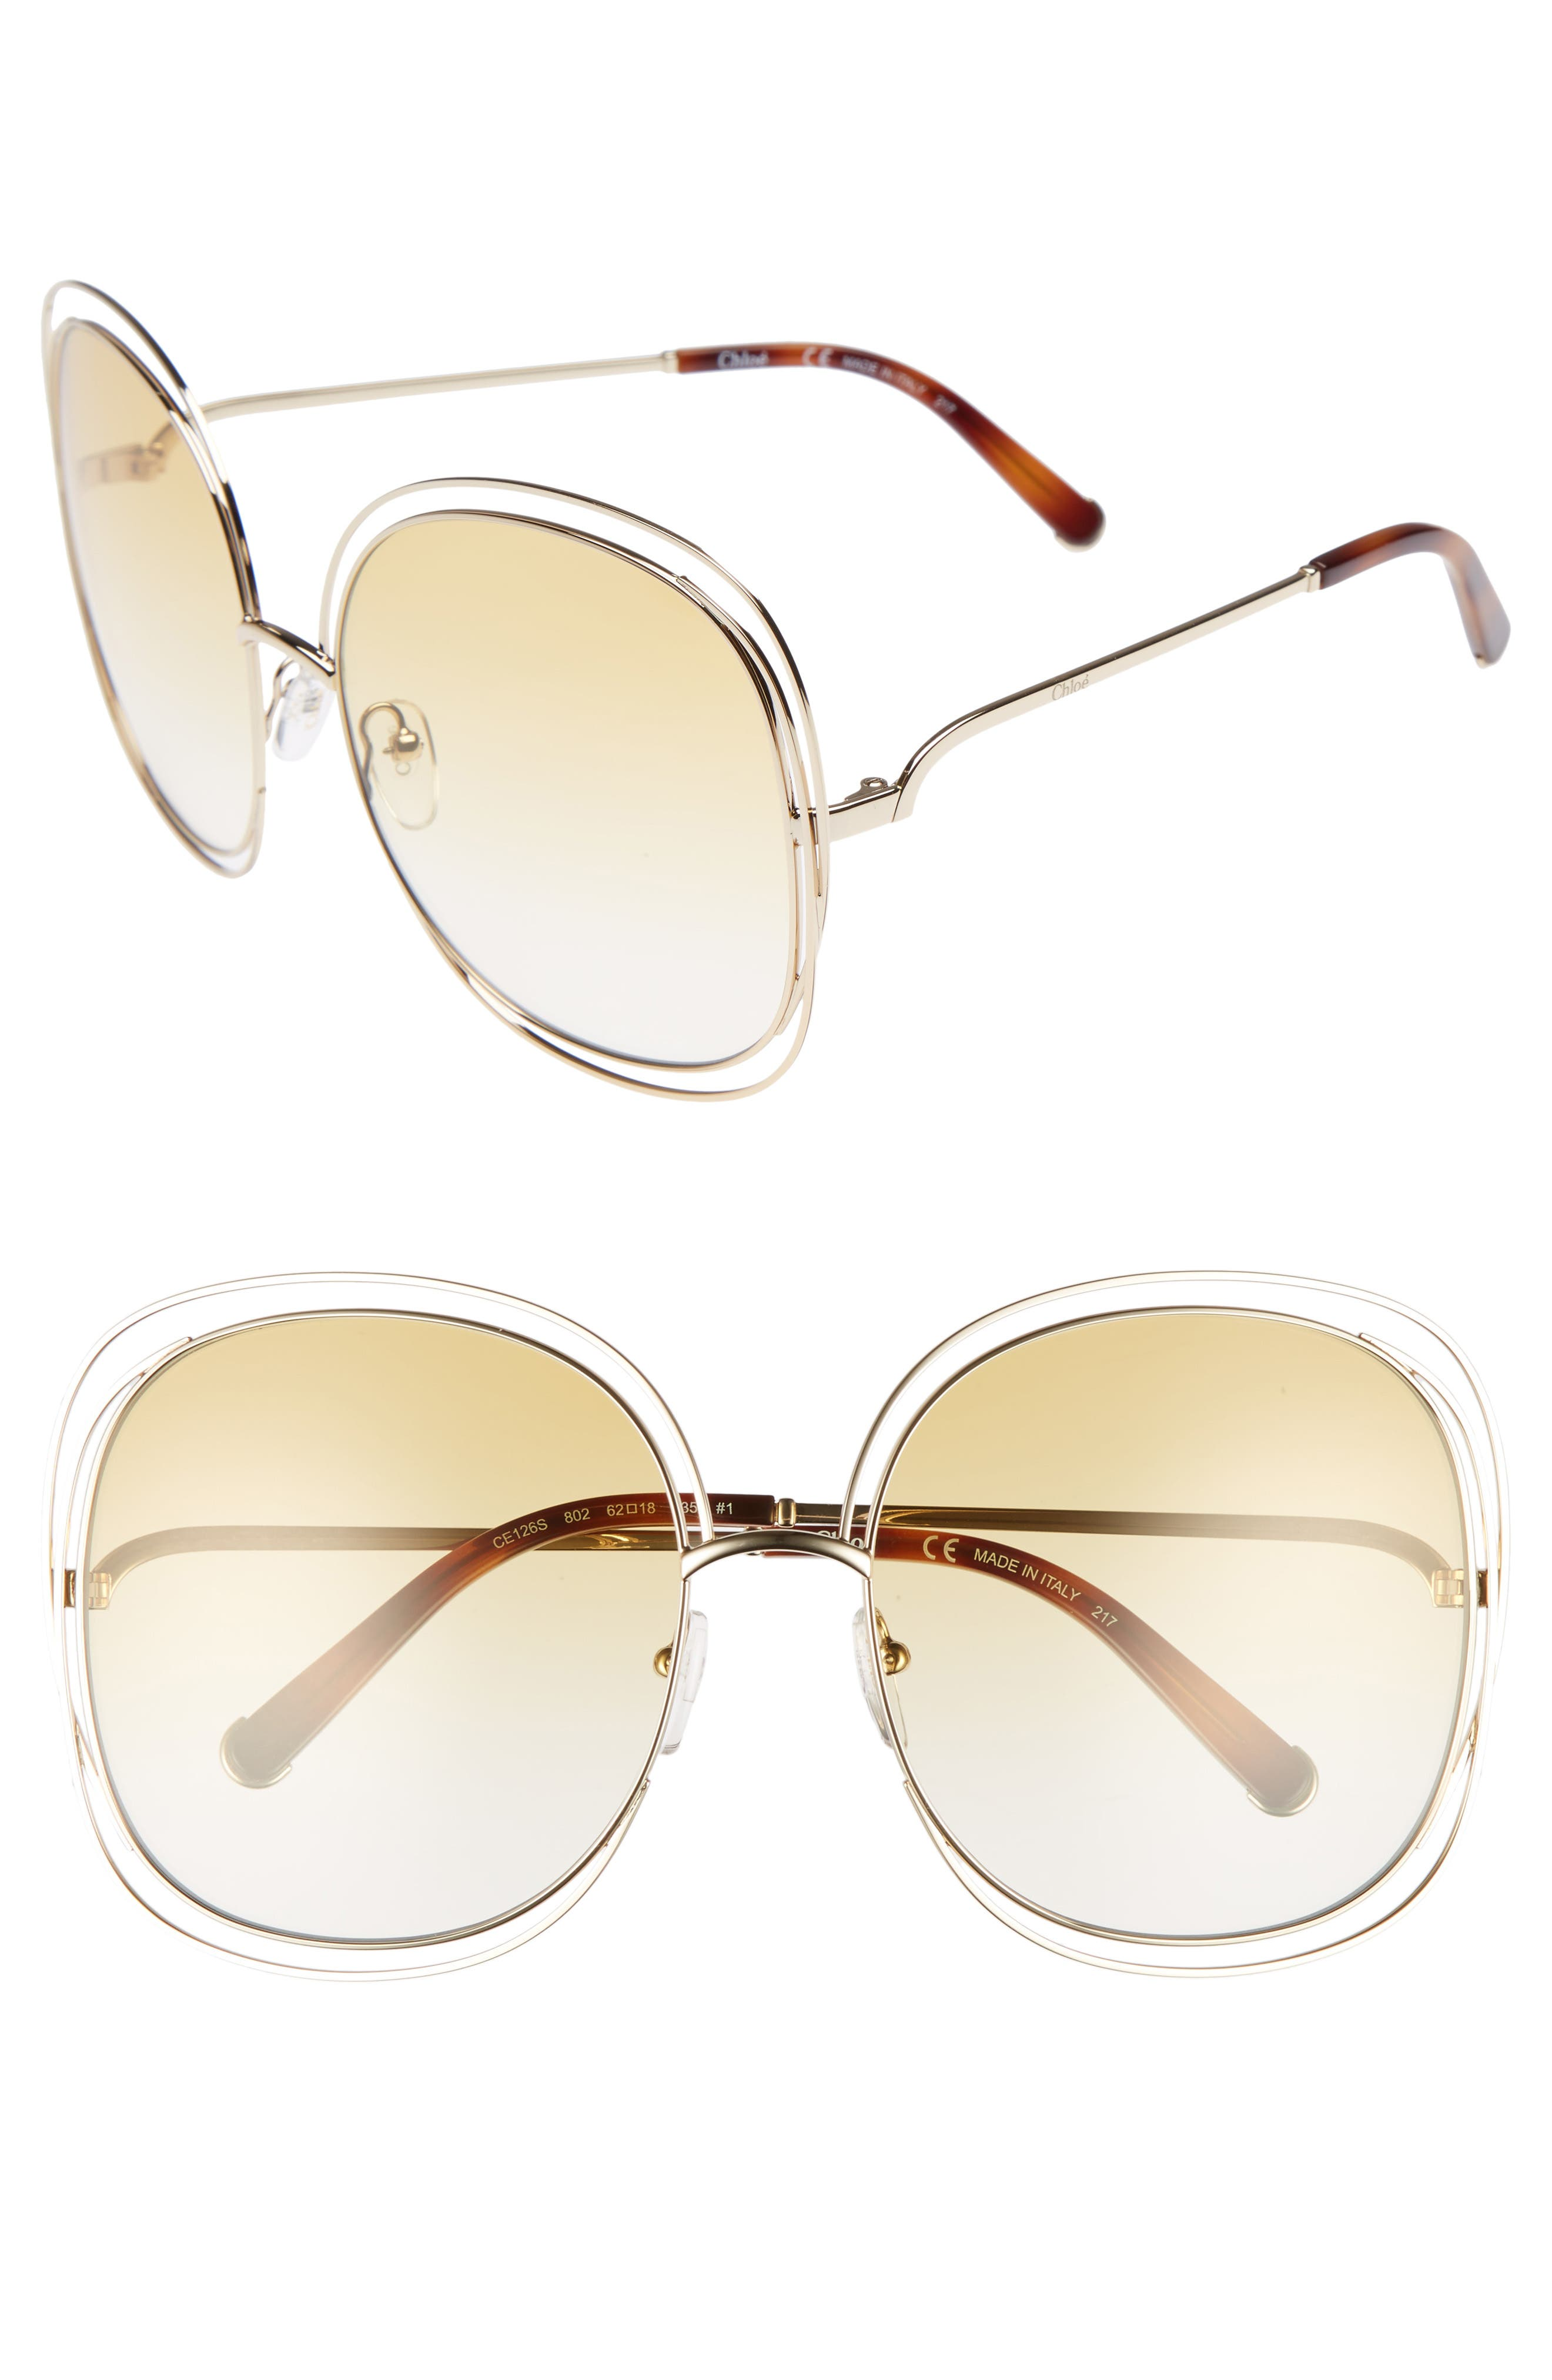 Main Image - Chloé Carlina 62mm Oversize Sunglasses